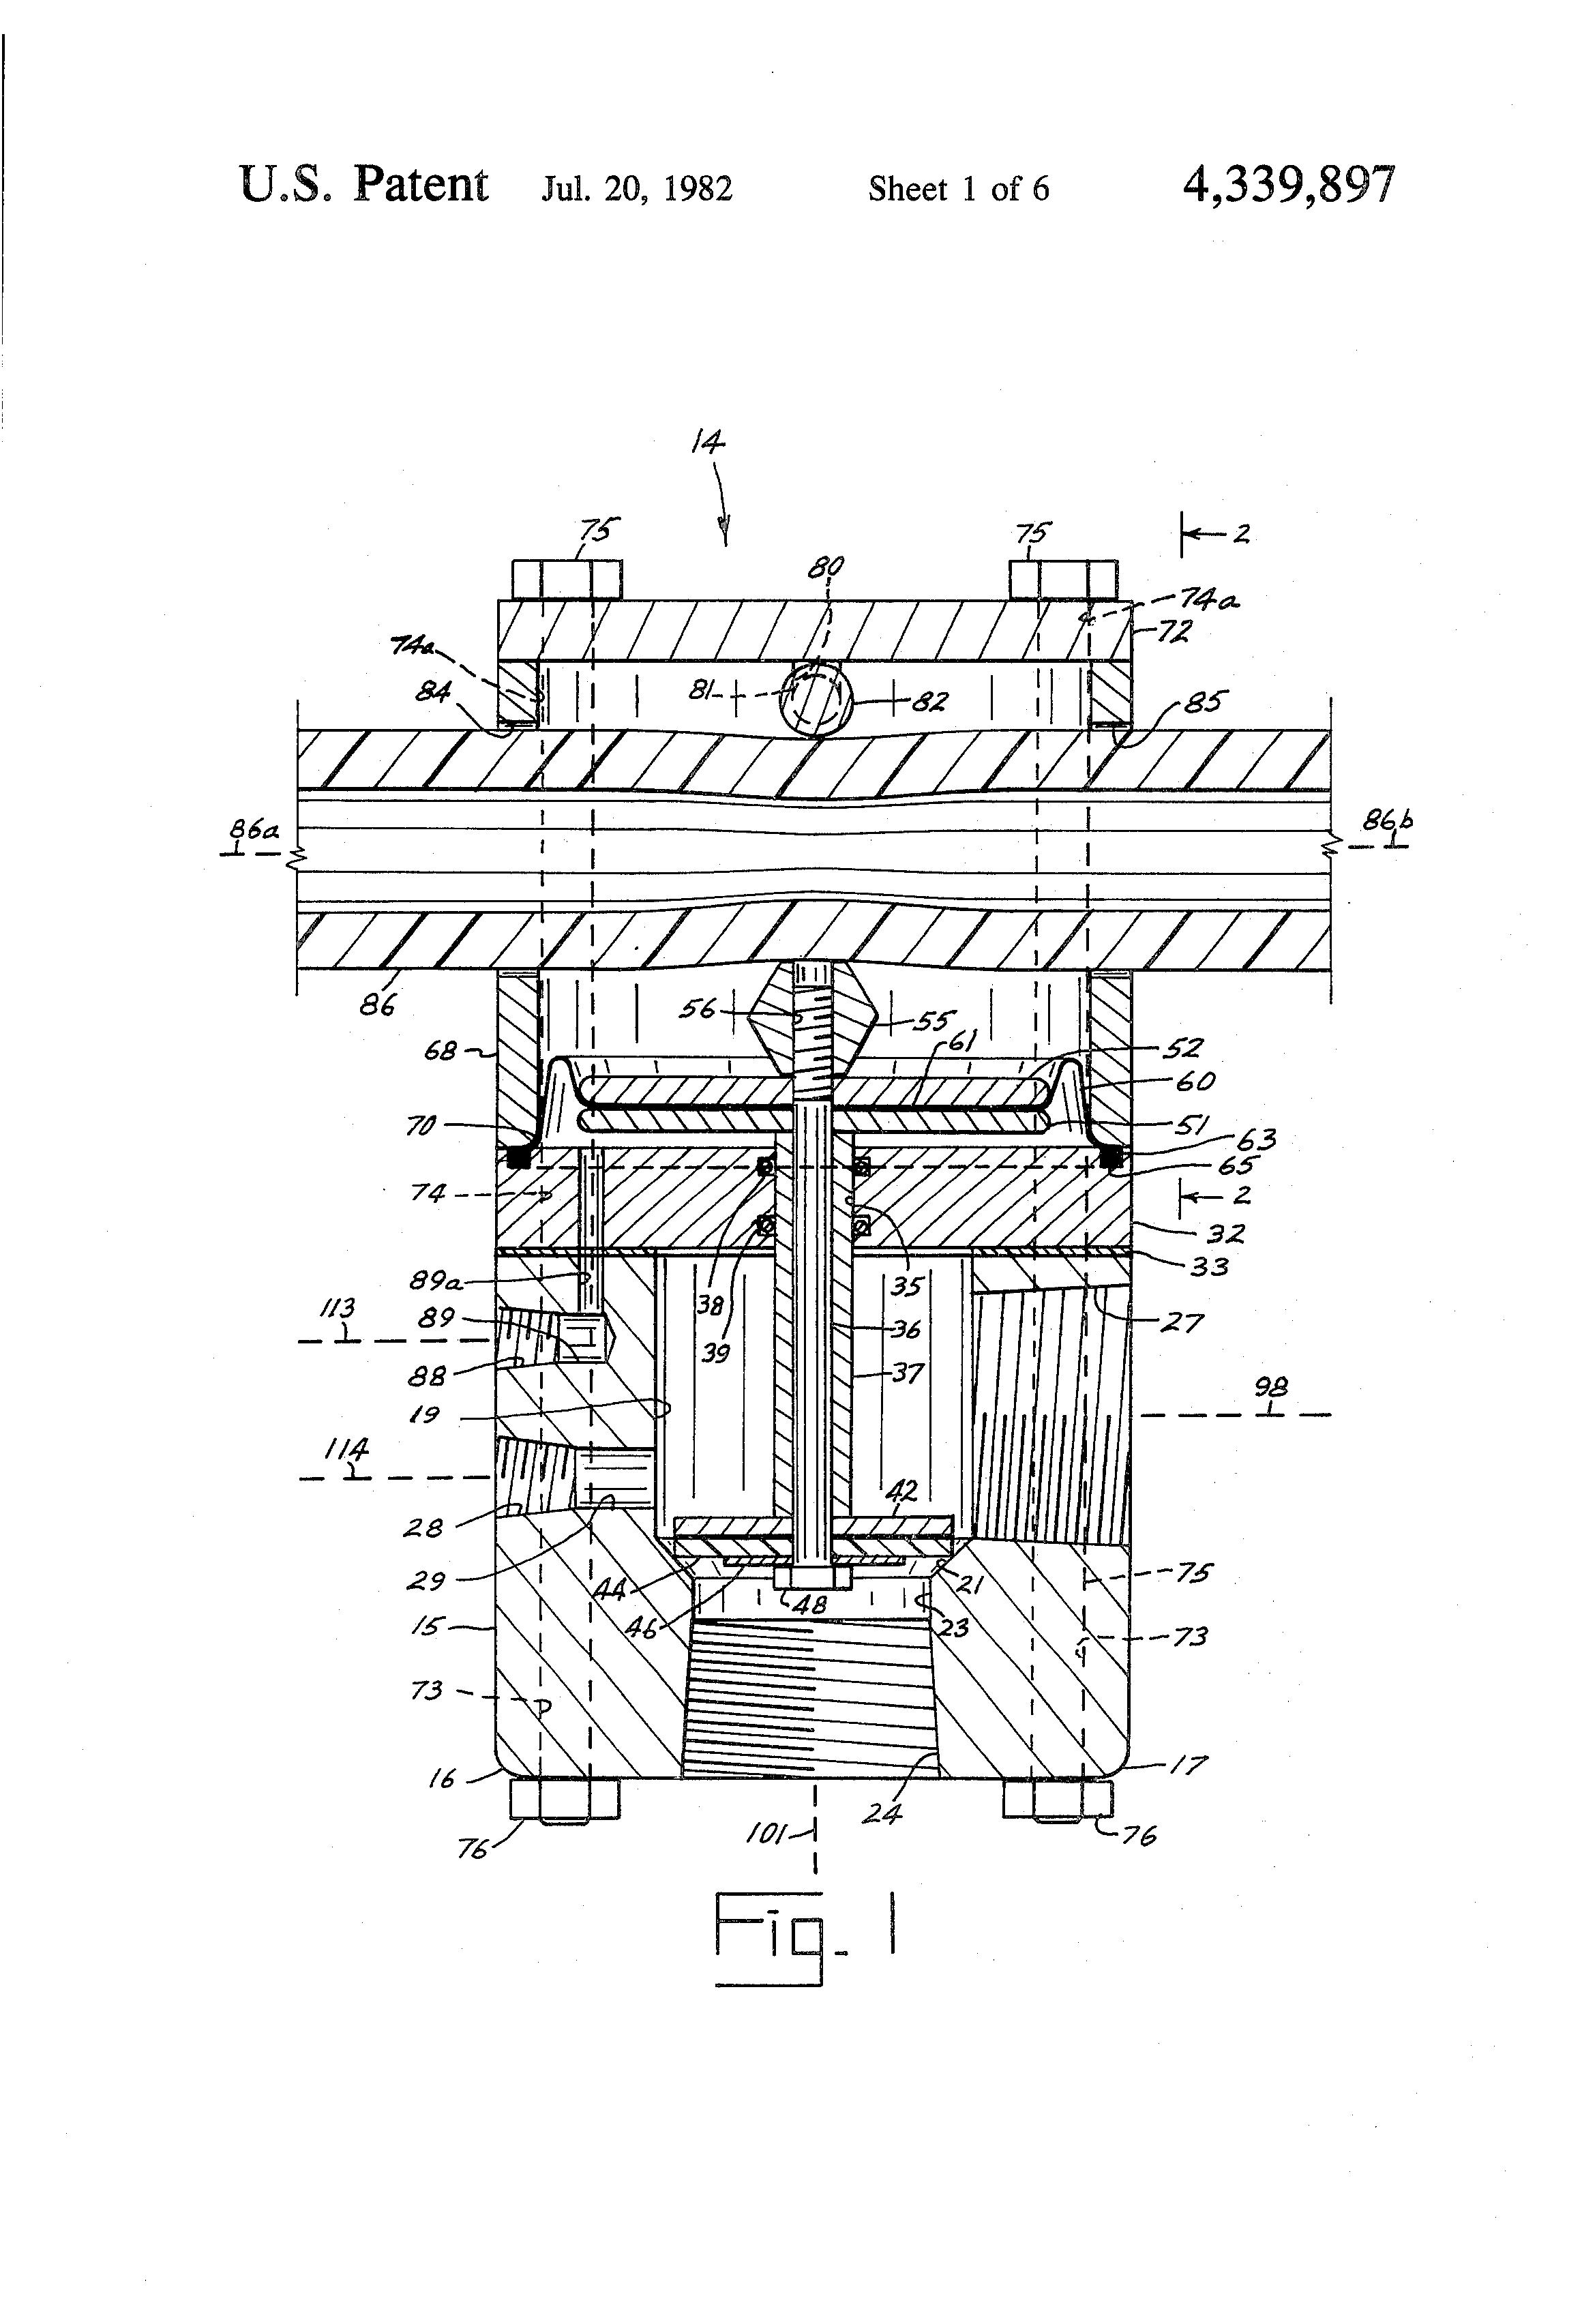 brevet us4339897 sandblasting methods and apparatus brevets Old Blasting Machines patent drawing